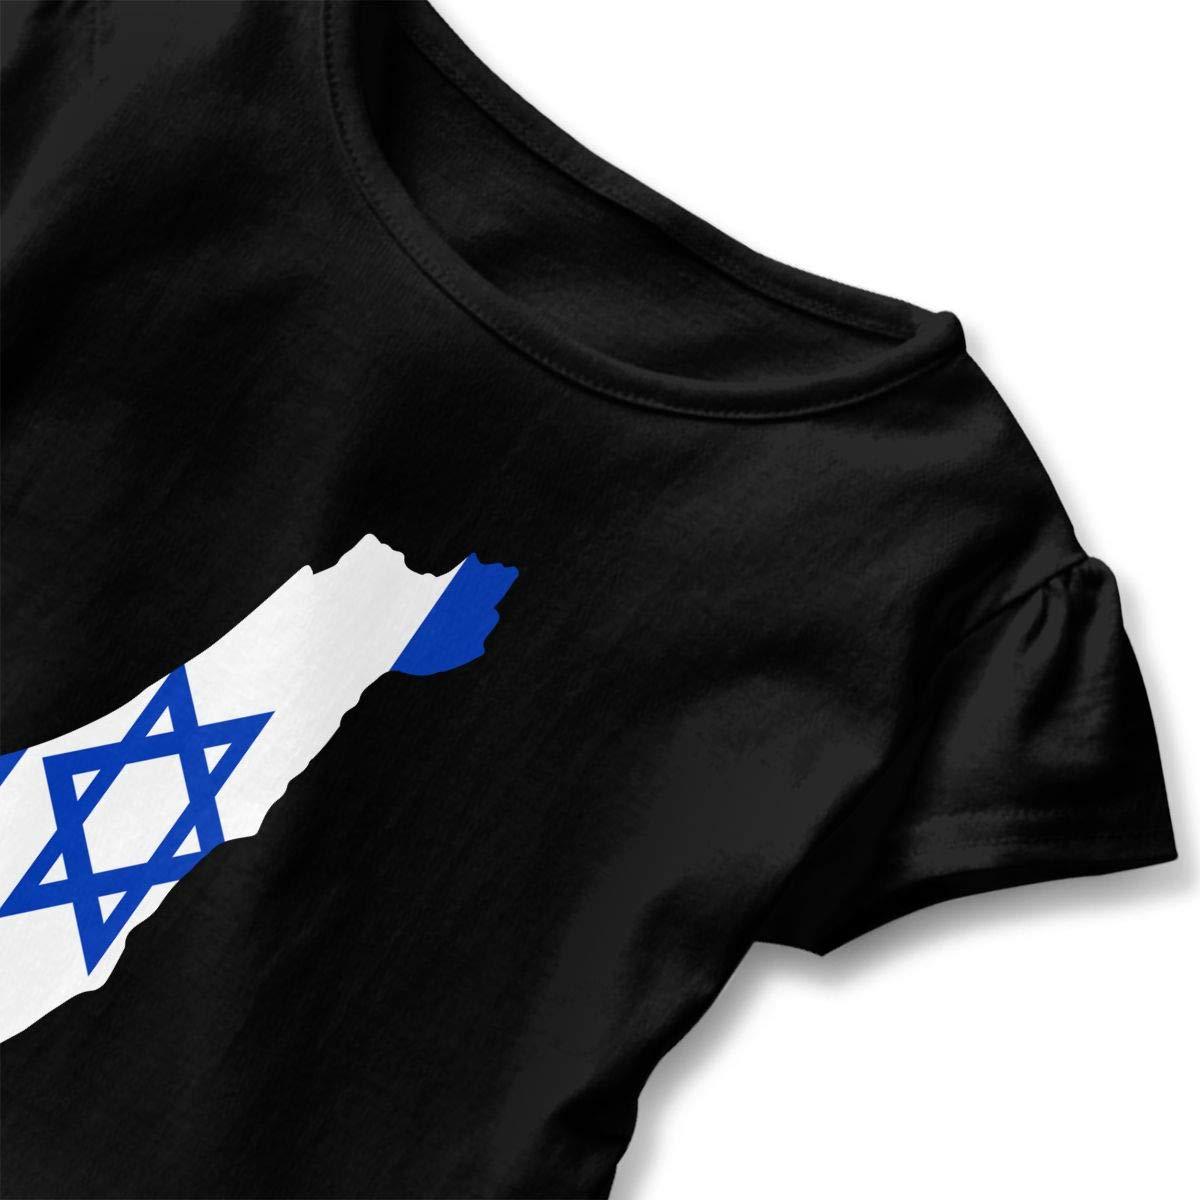 Vfbggg-Shirt Israel Flag Map Baby Girls Short Sleeve Ruffle Tee Cotton Kids T Shirts 2-6 Years